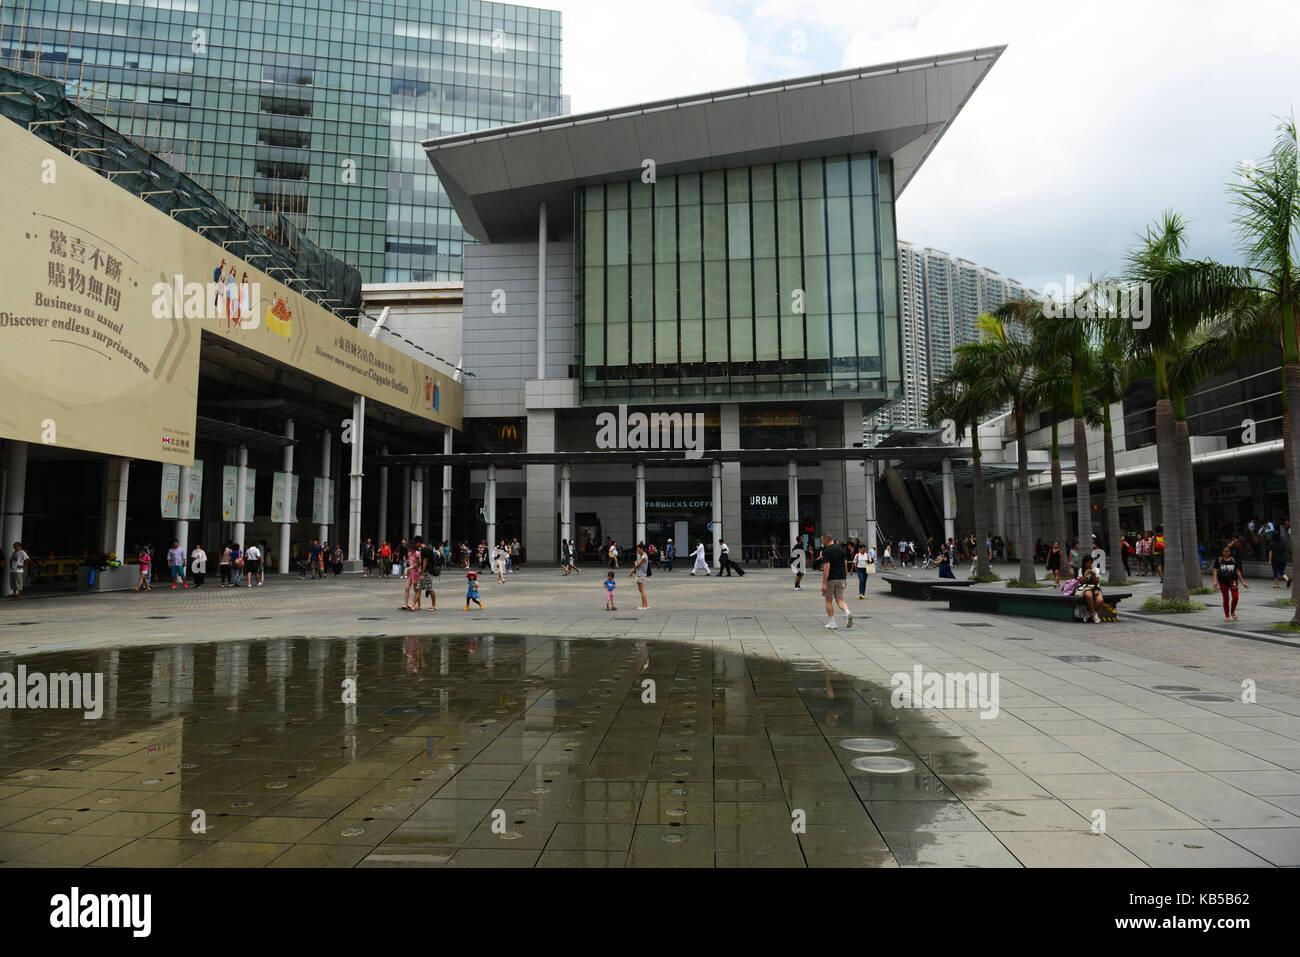 Citygate mall in Tung Chung, Lantau, Hong Kong. - Stock Image